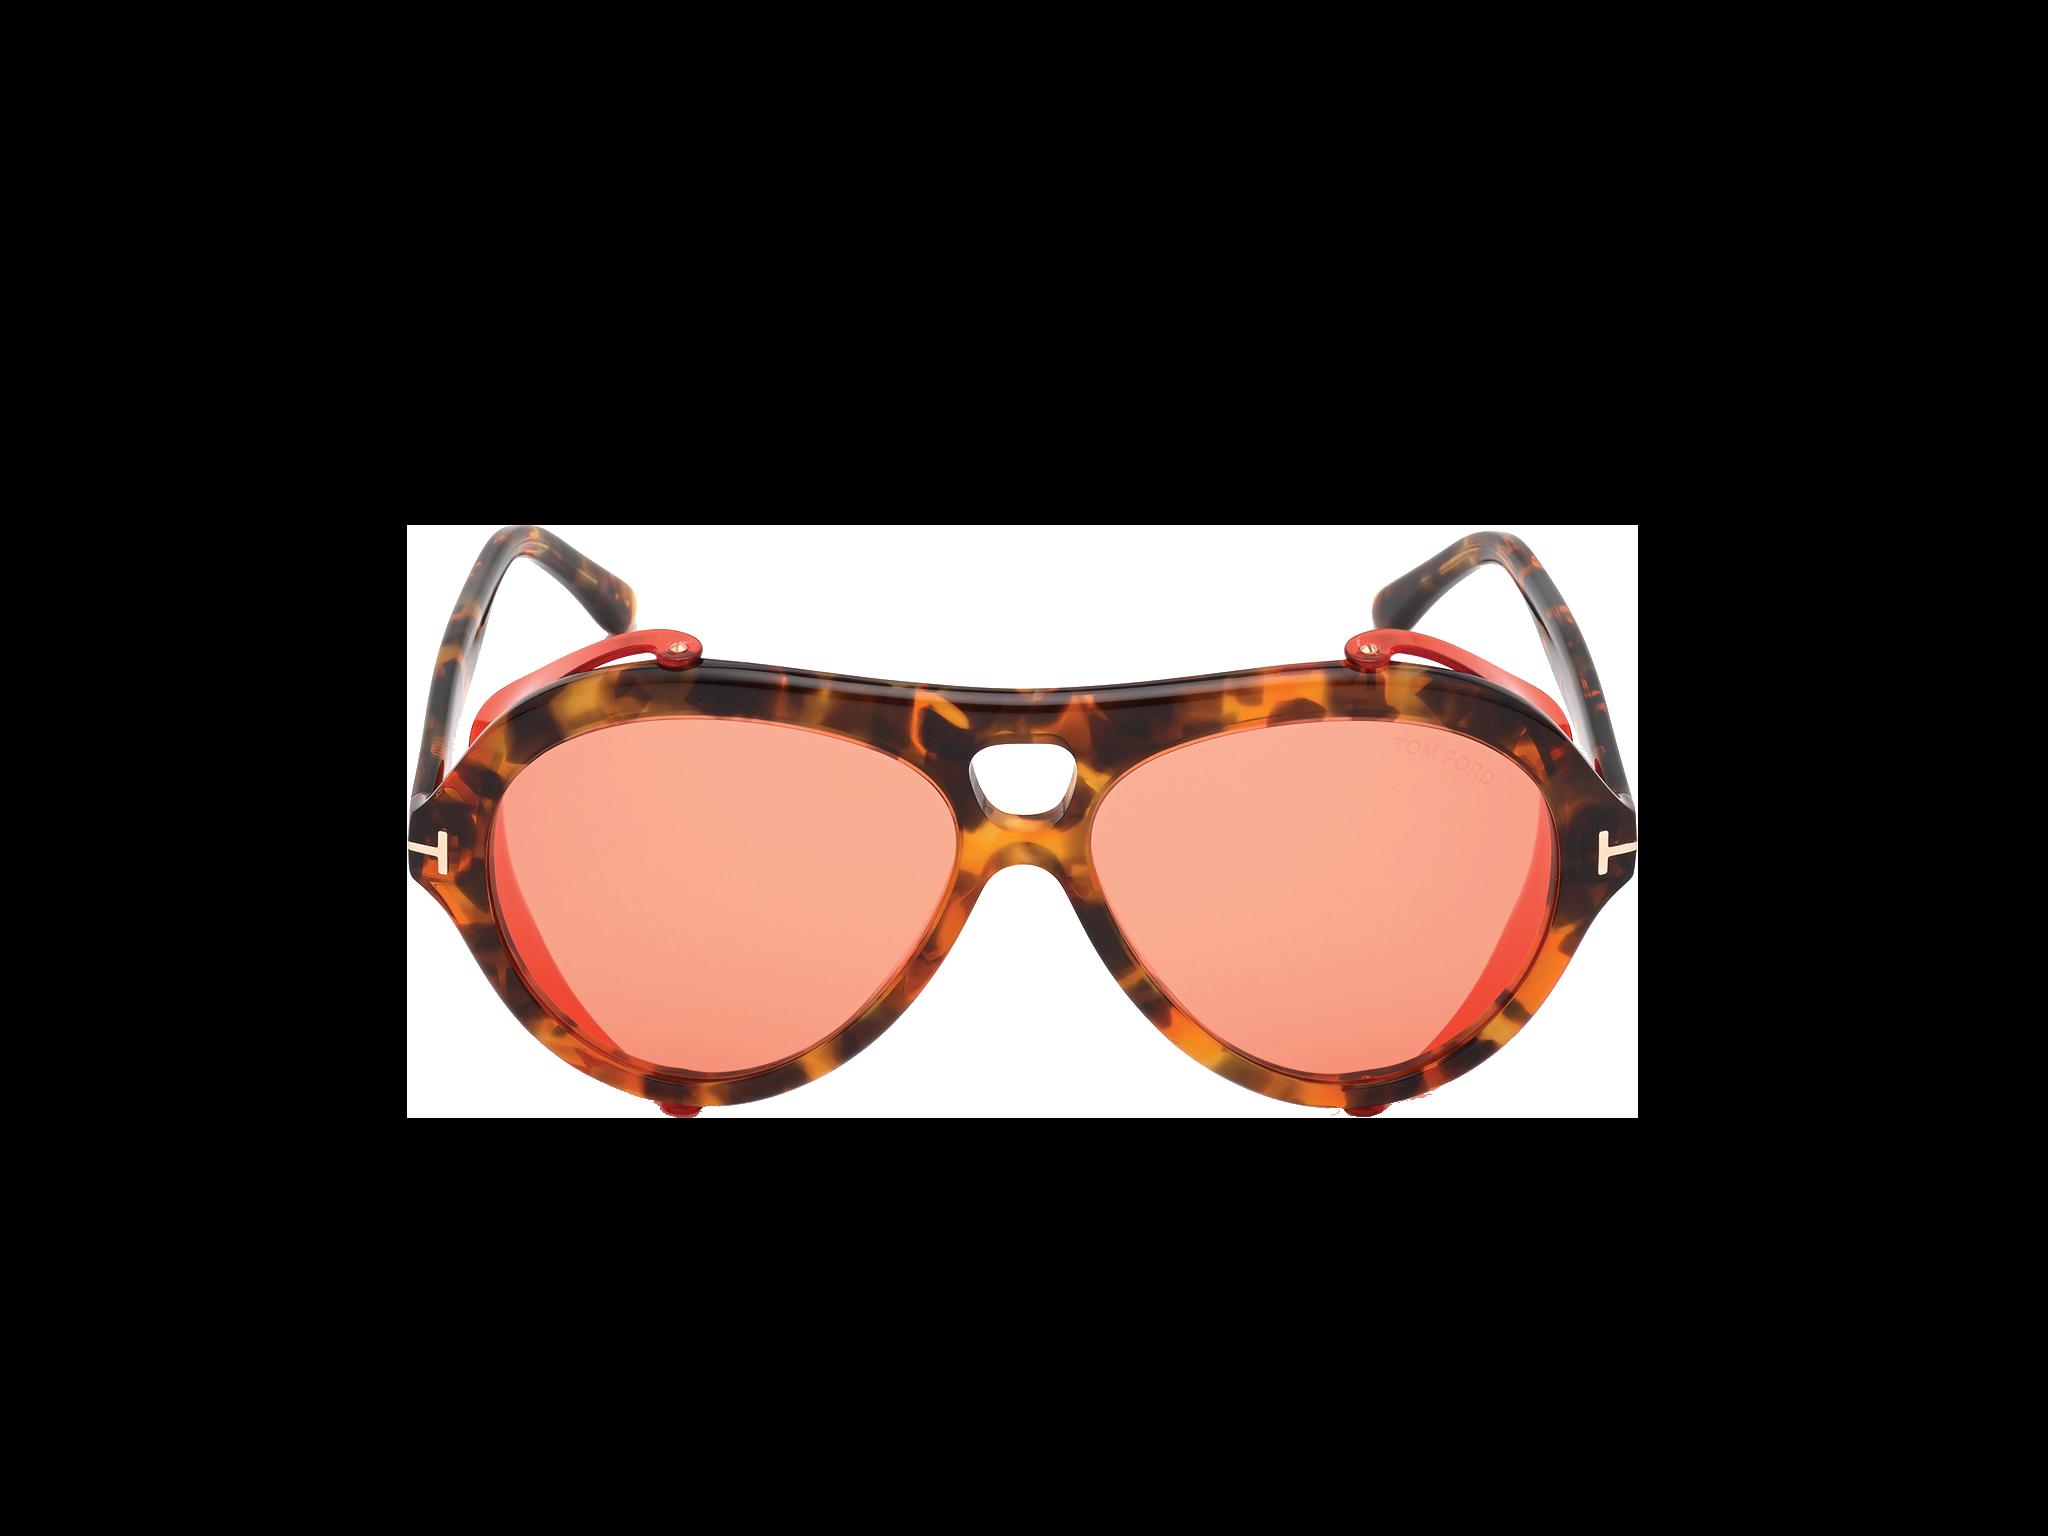 Sunglasses Guide 2021 - Tom Ford